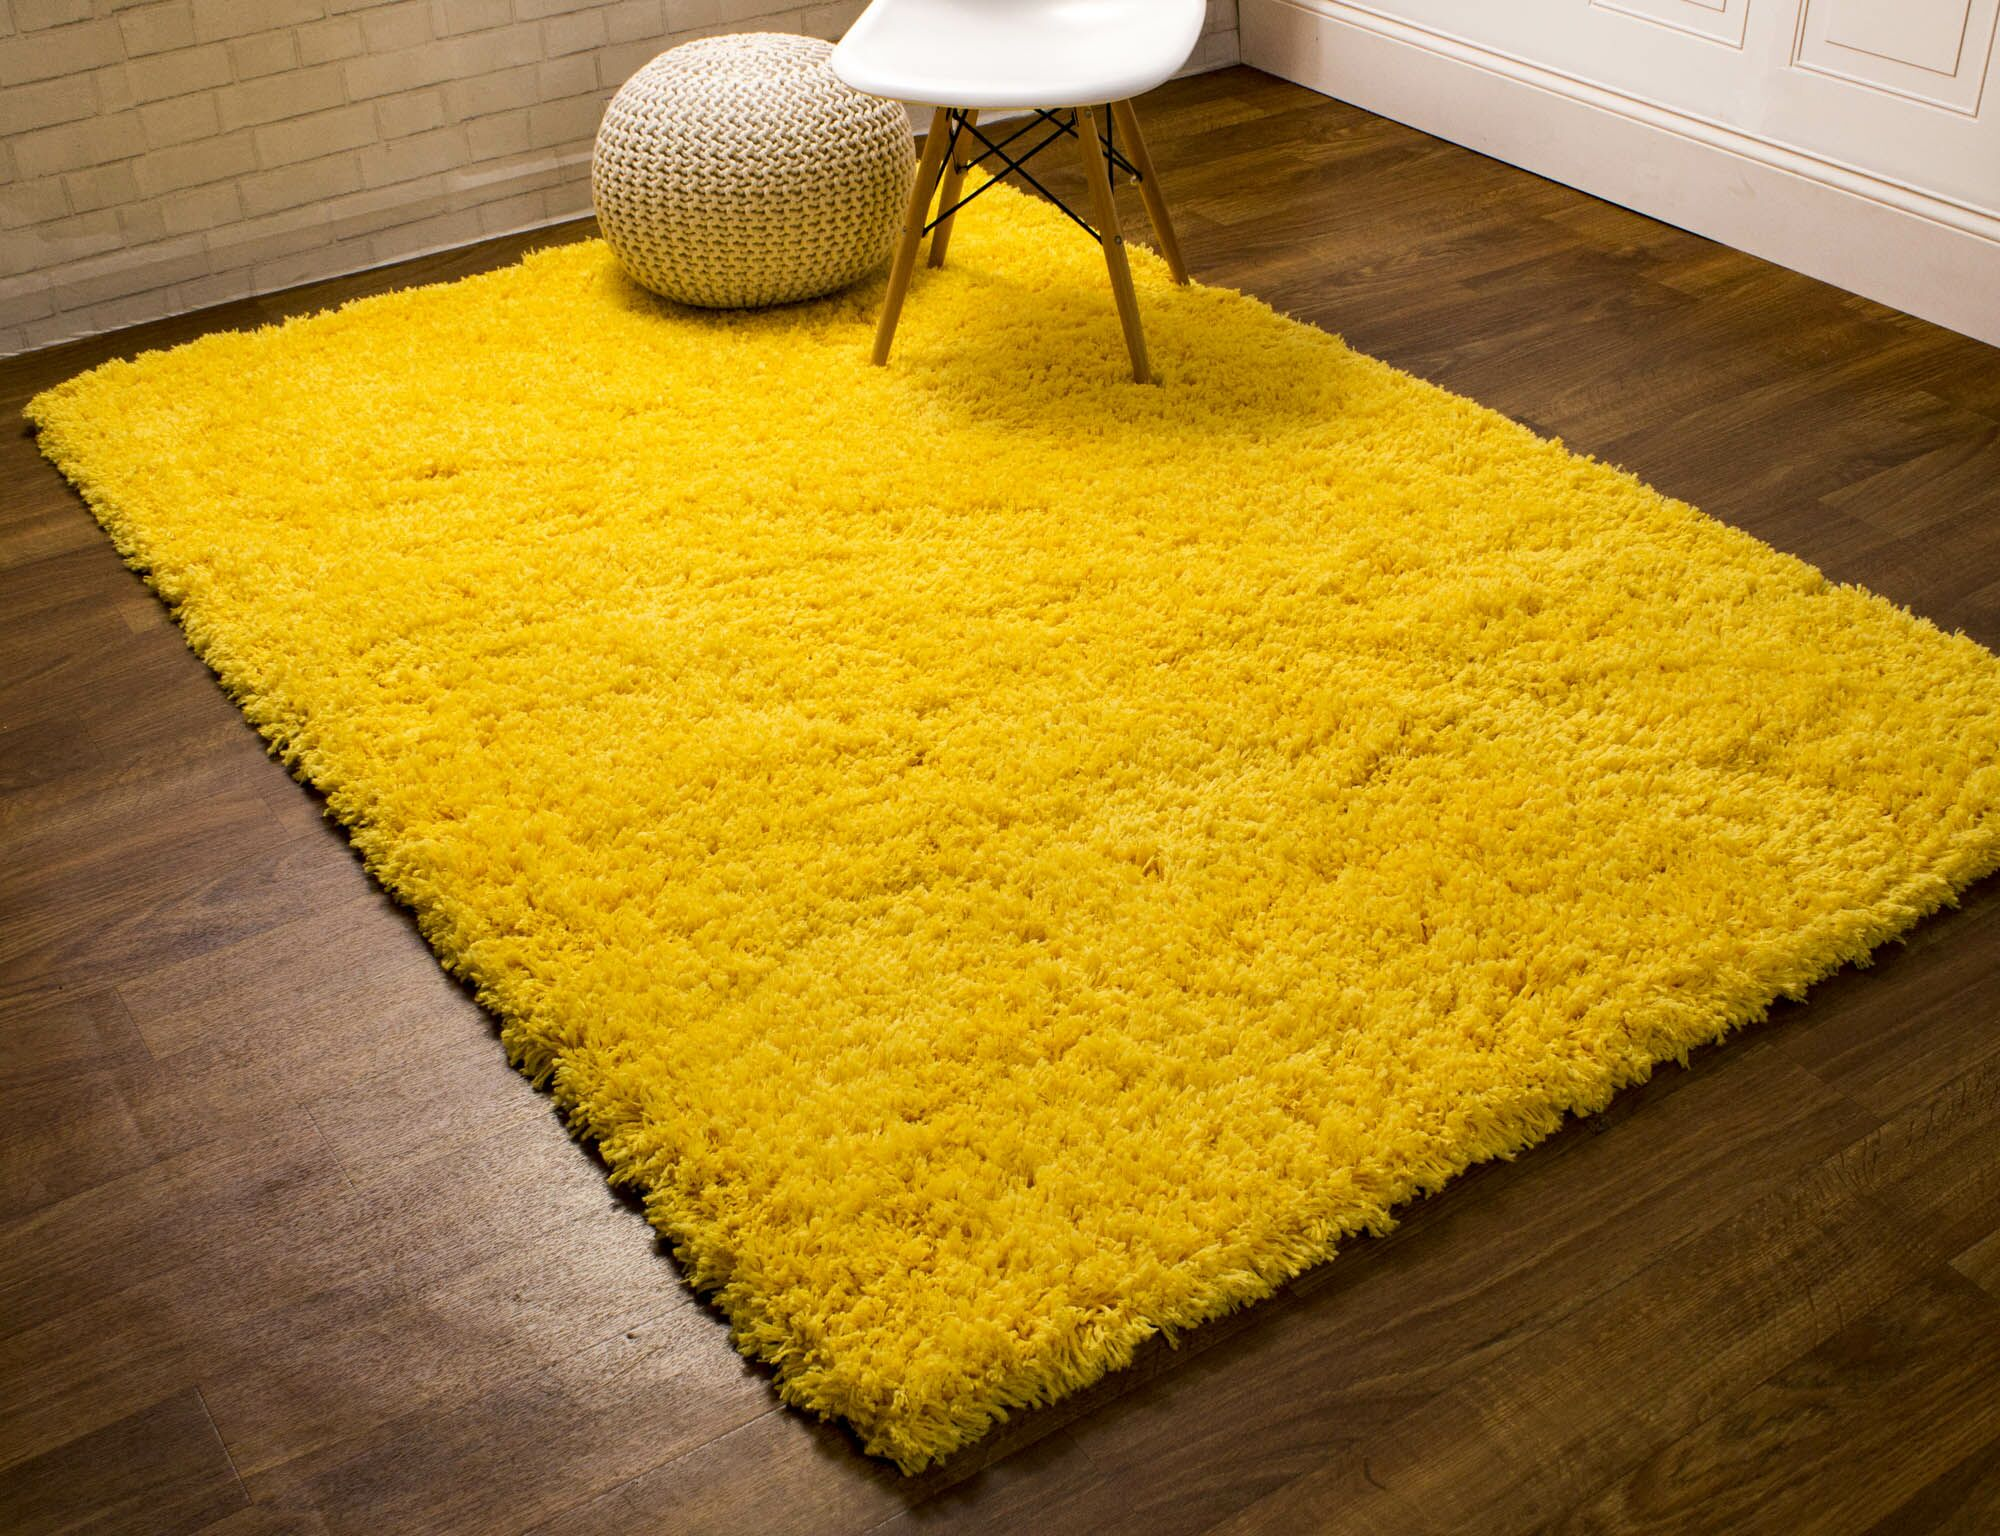 Cloud Microfiber Ultra Soft Shag Light Yellow Area Rug Rug Size: 2' x 3'